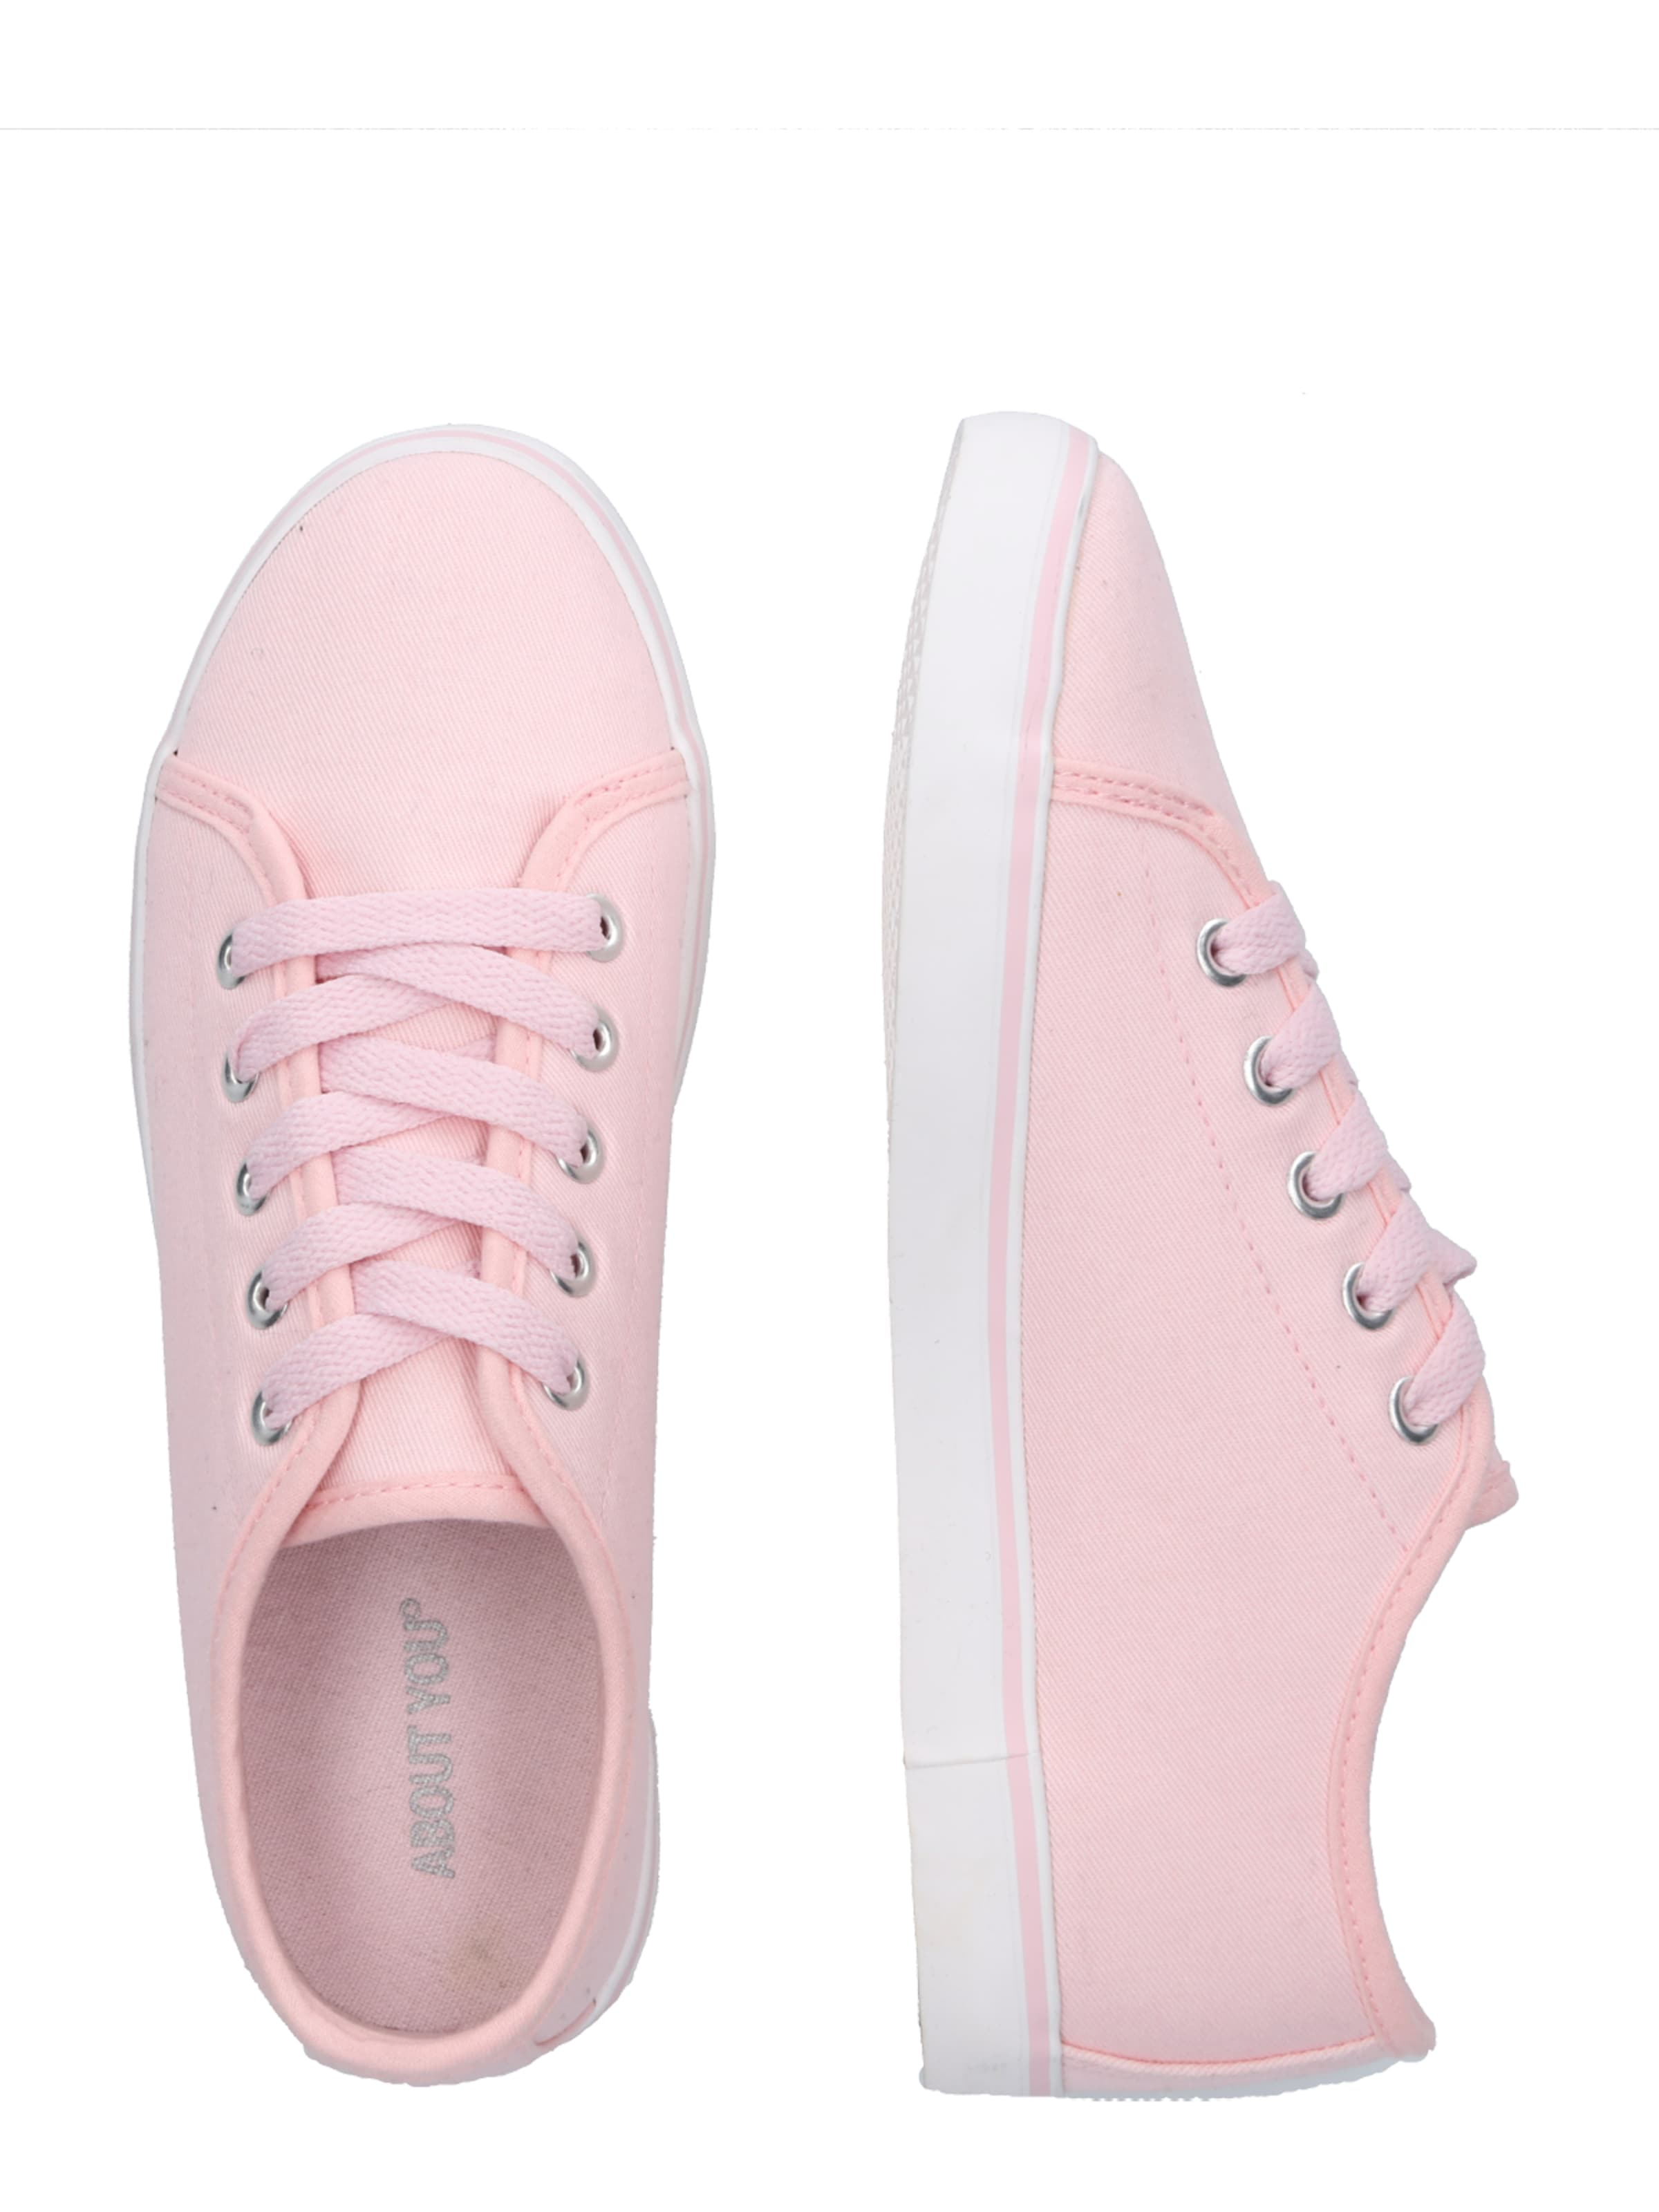 Rosa About 'henriette You In Shoe' Sneaker IEH9W2D